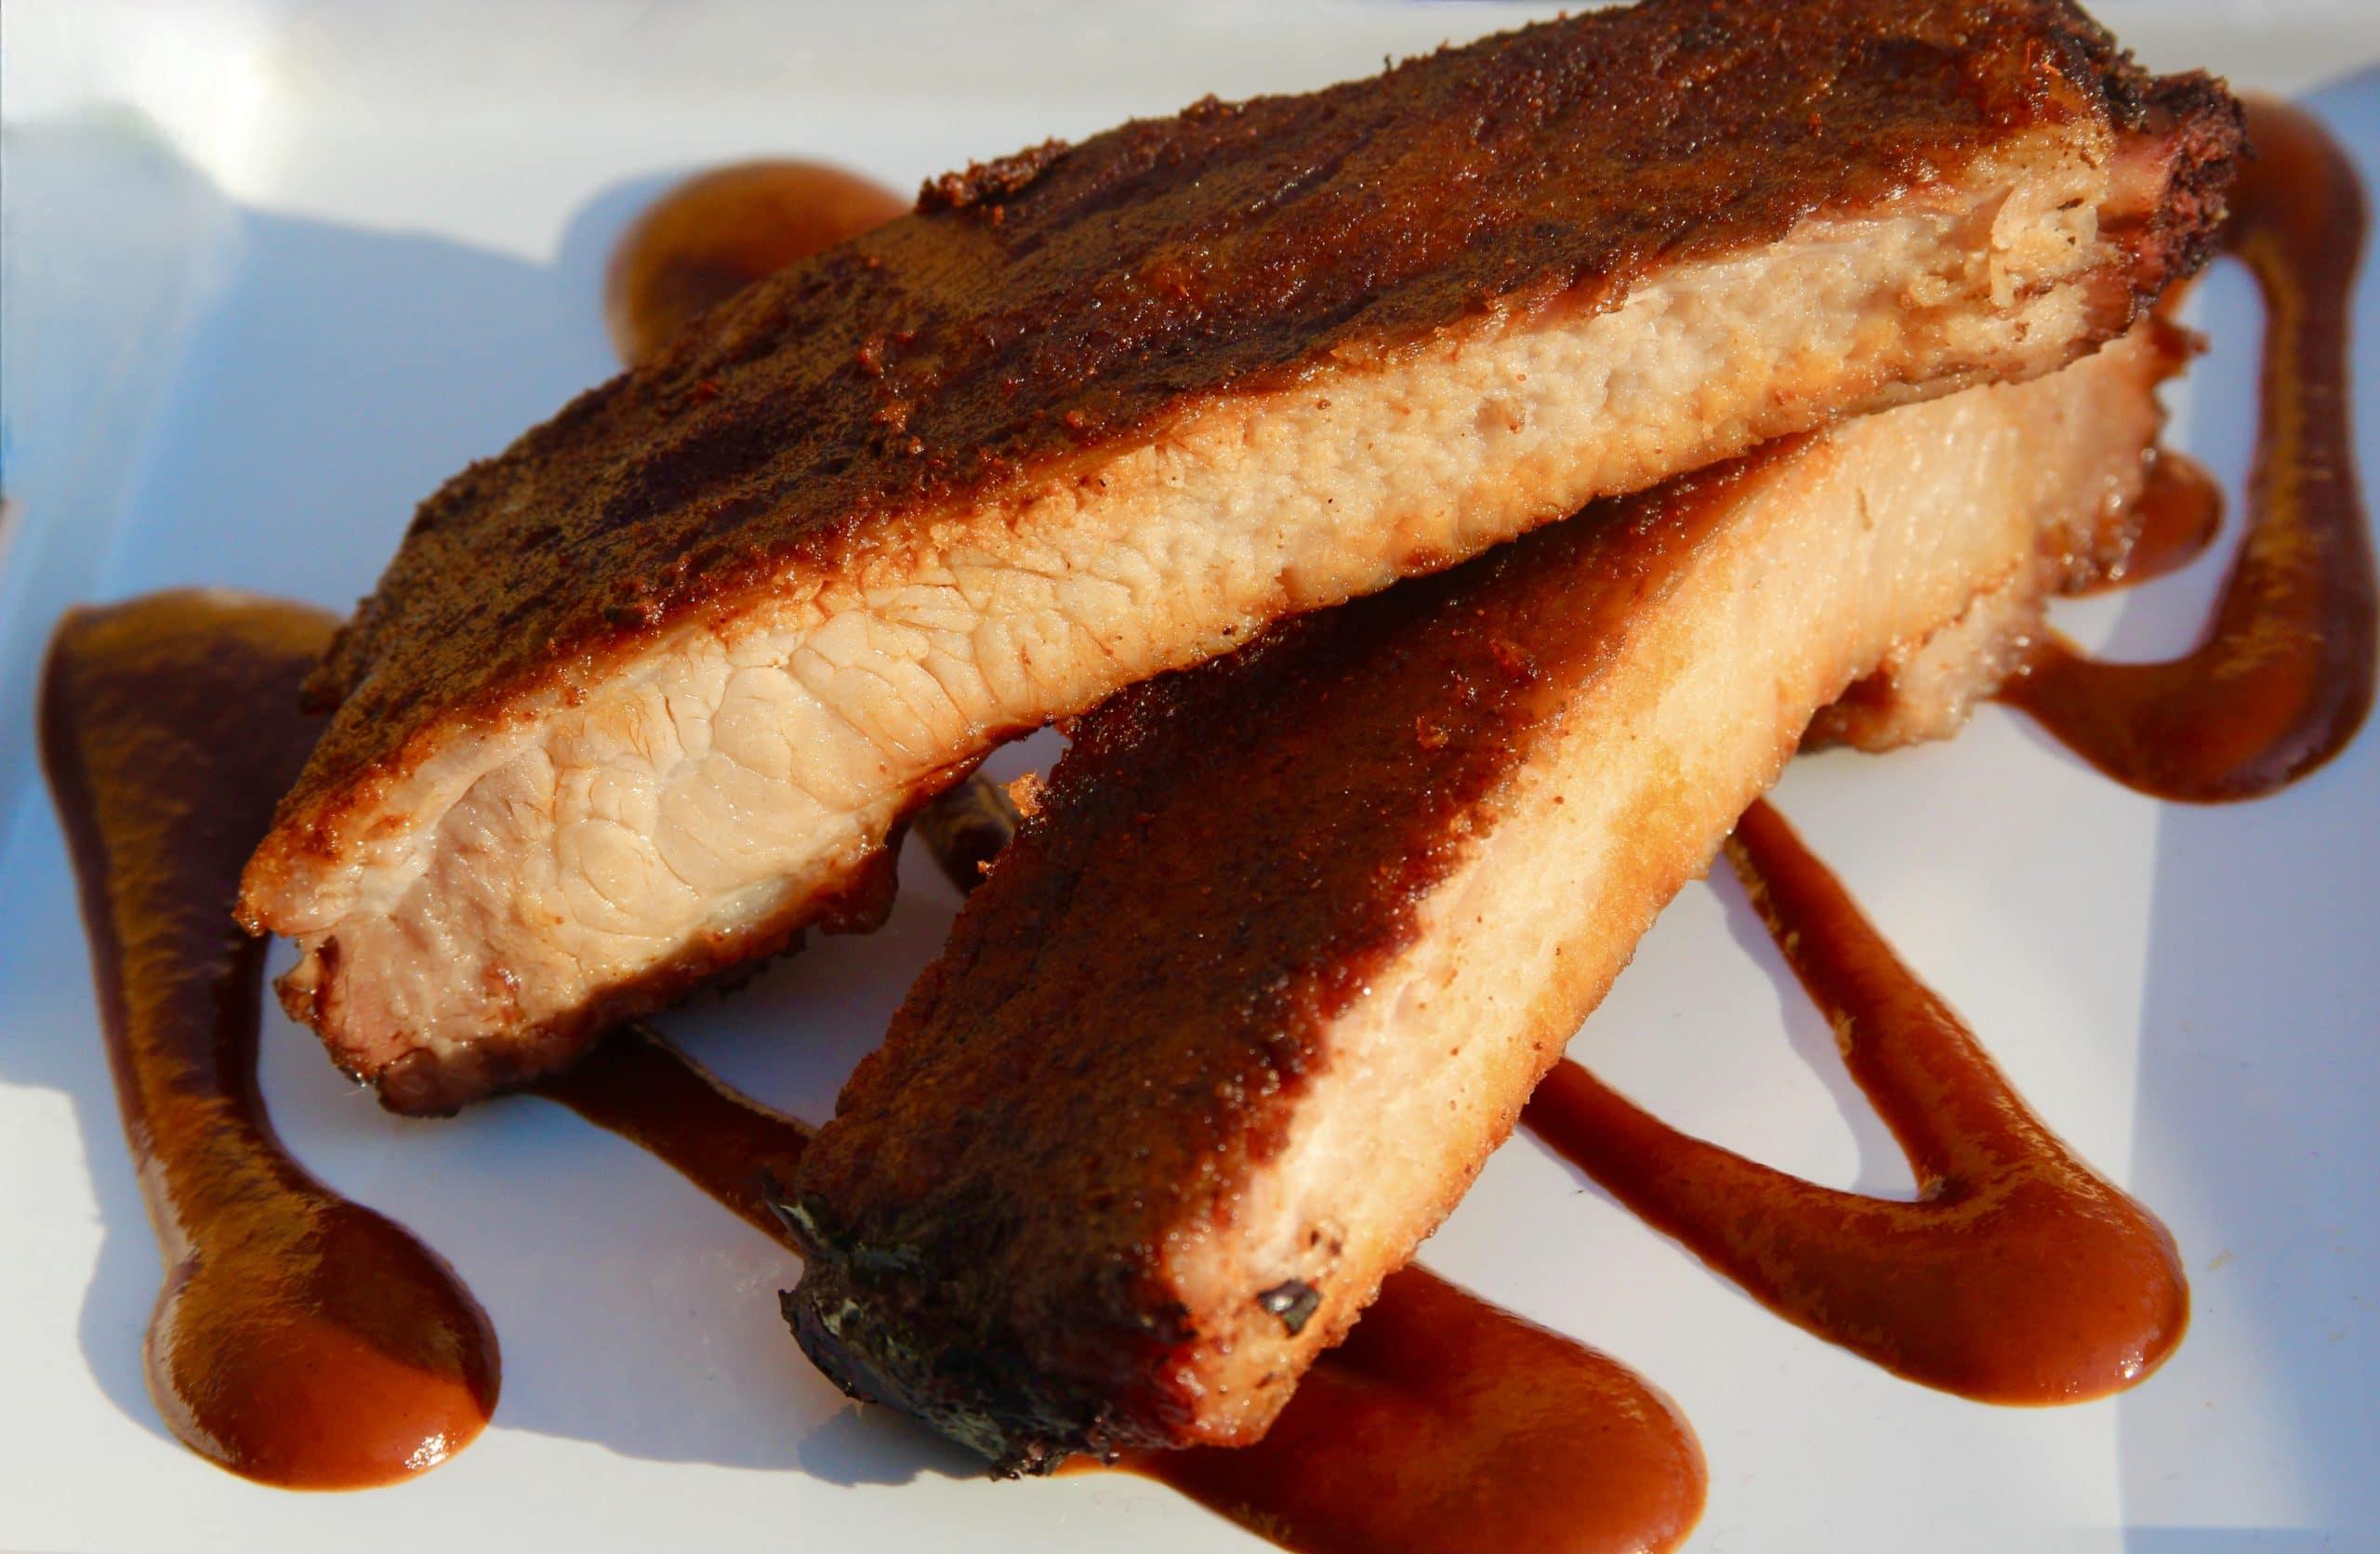 Sliced ribs on a plate